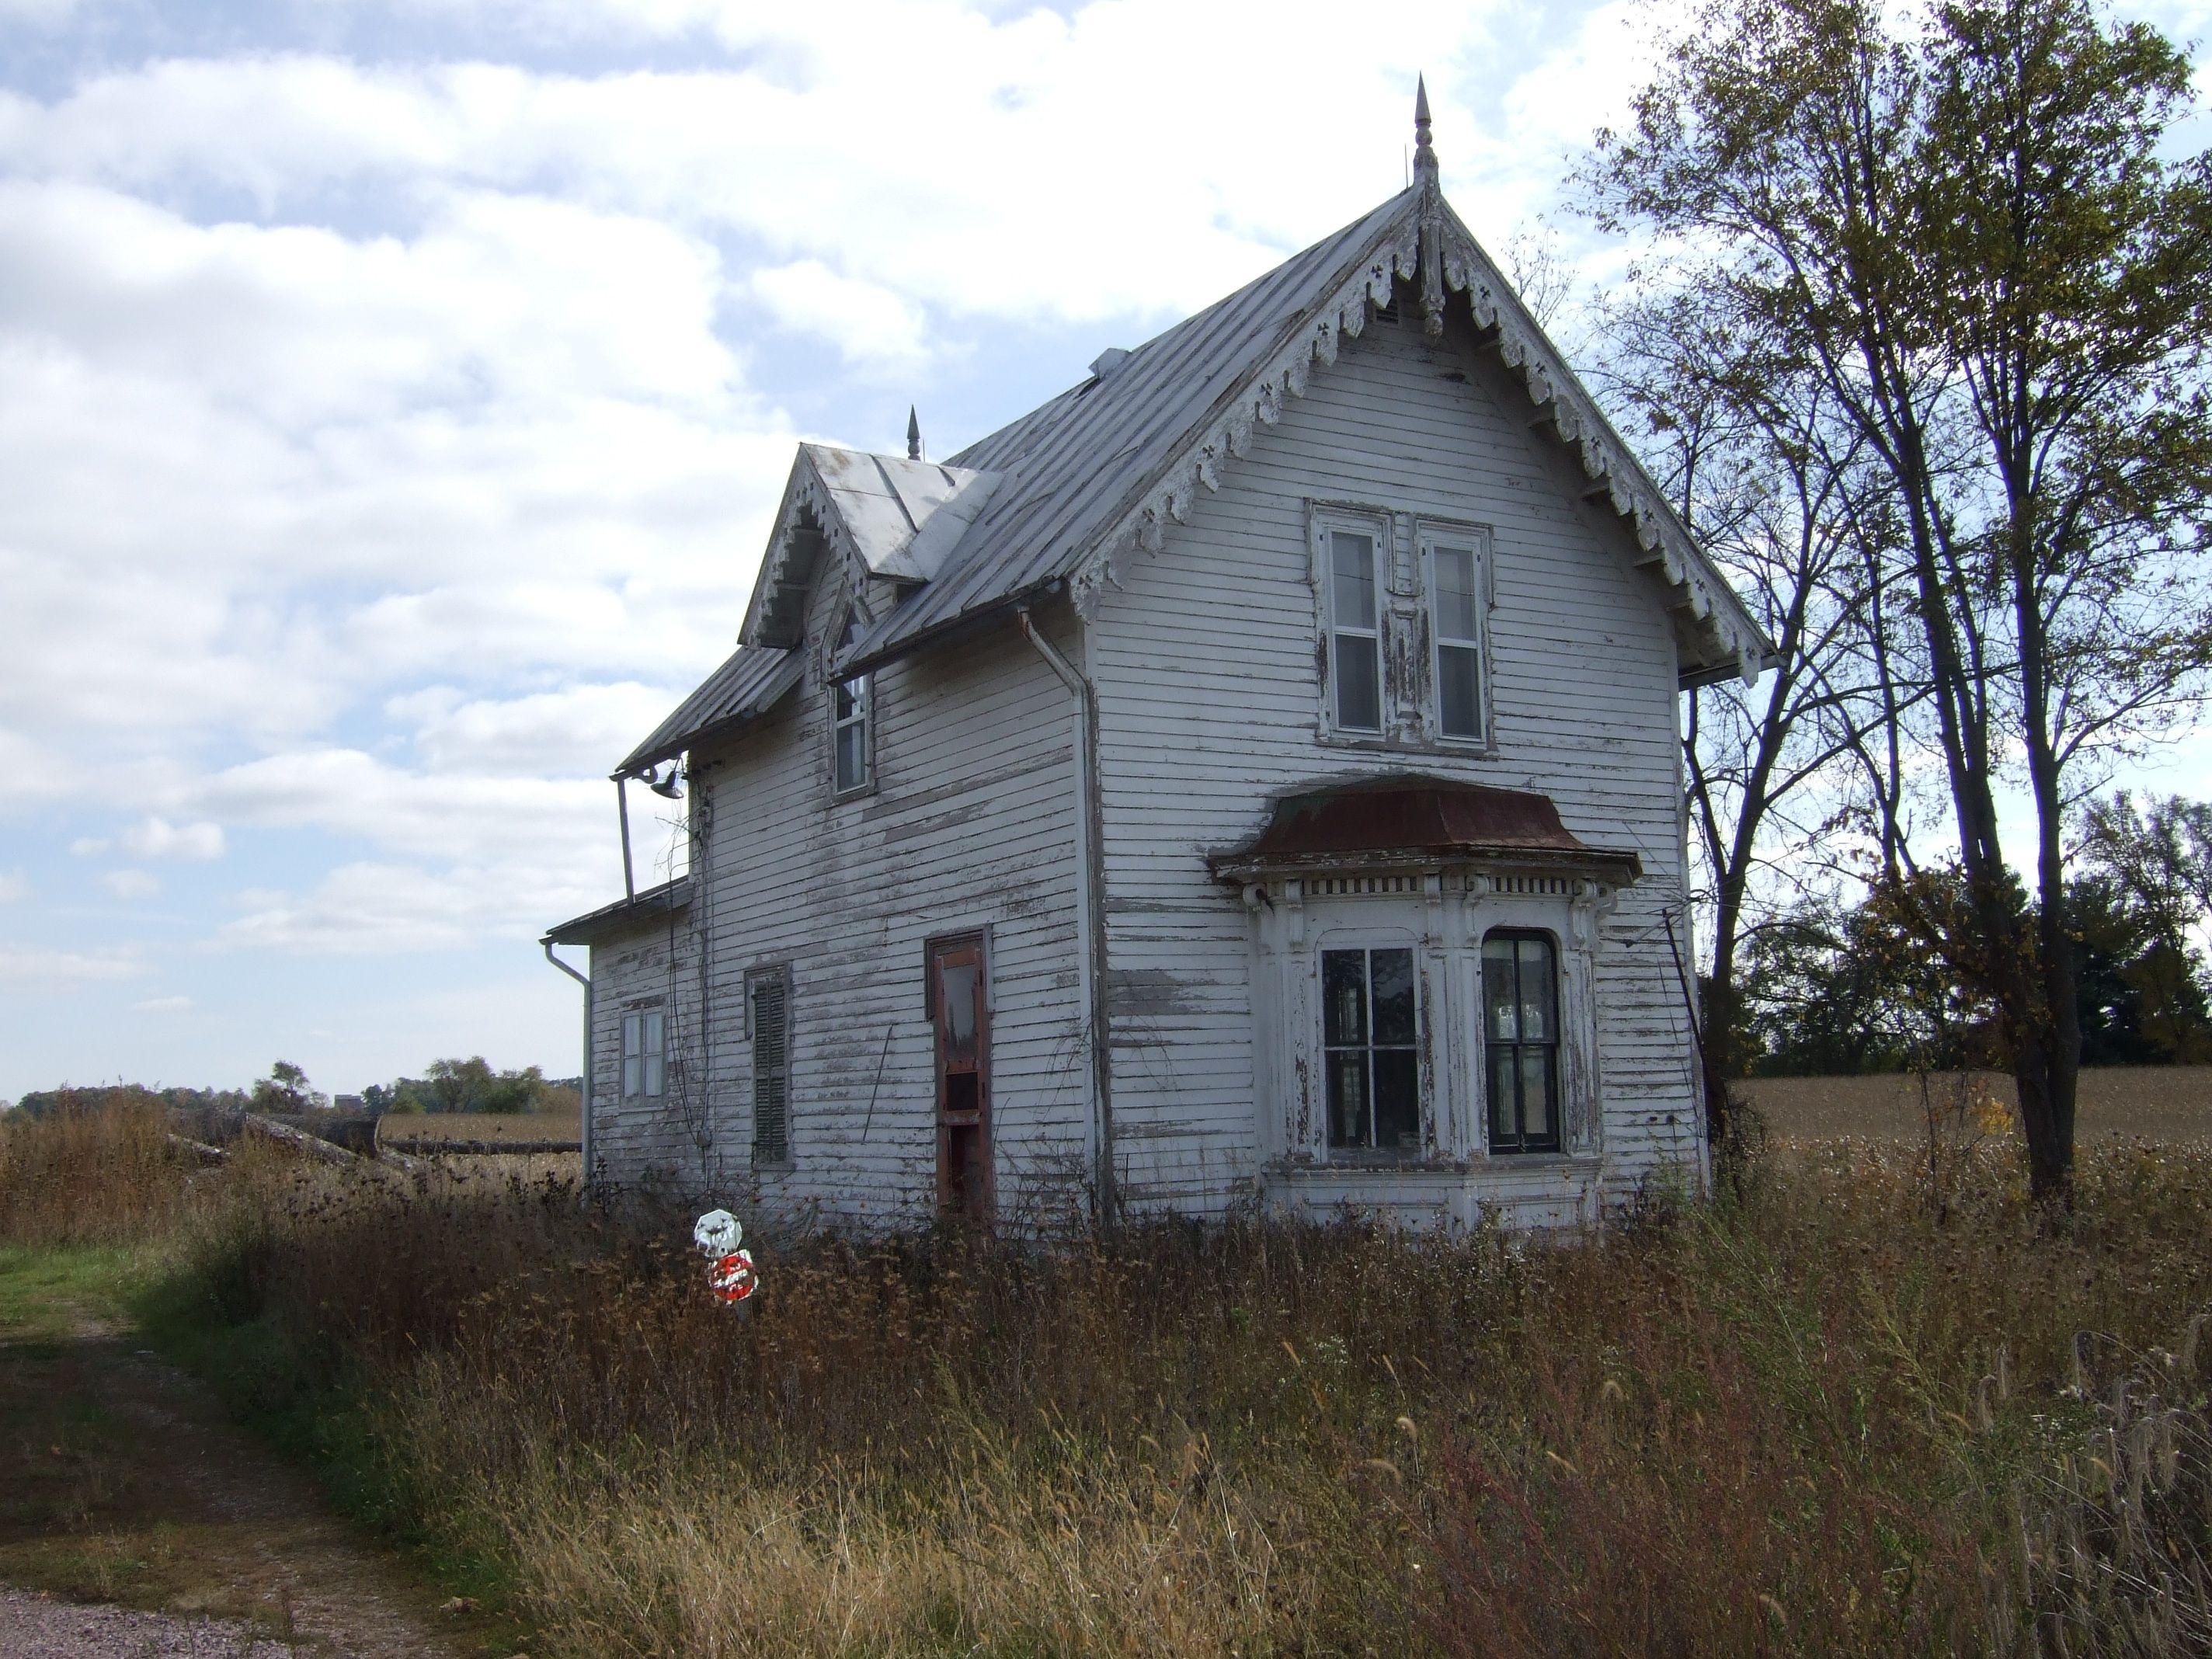 Abandoned Farmhouse Abandoned houses, Abandoned farm